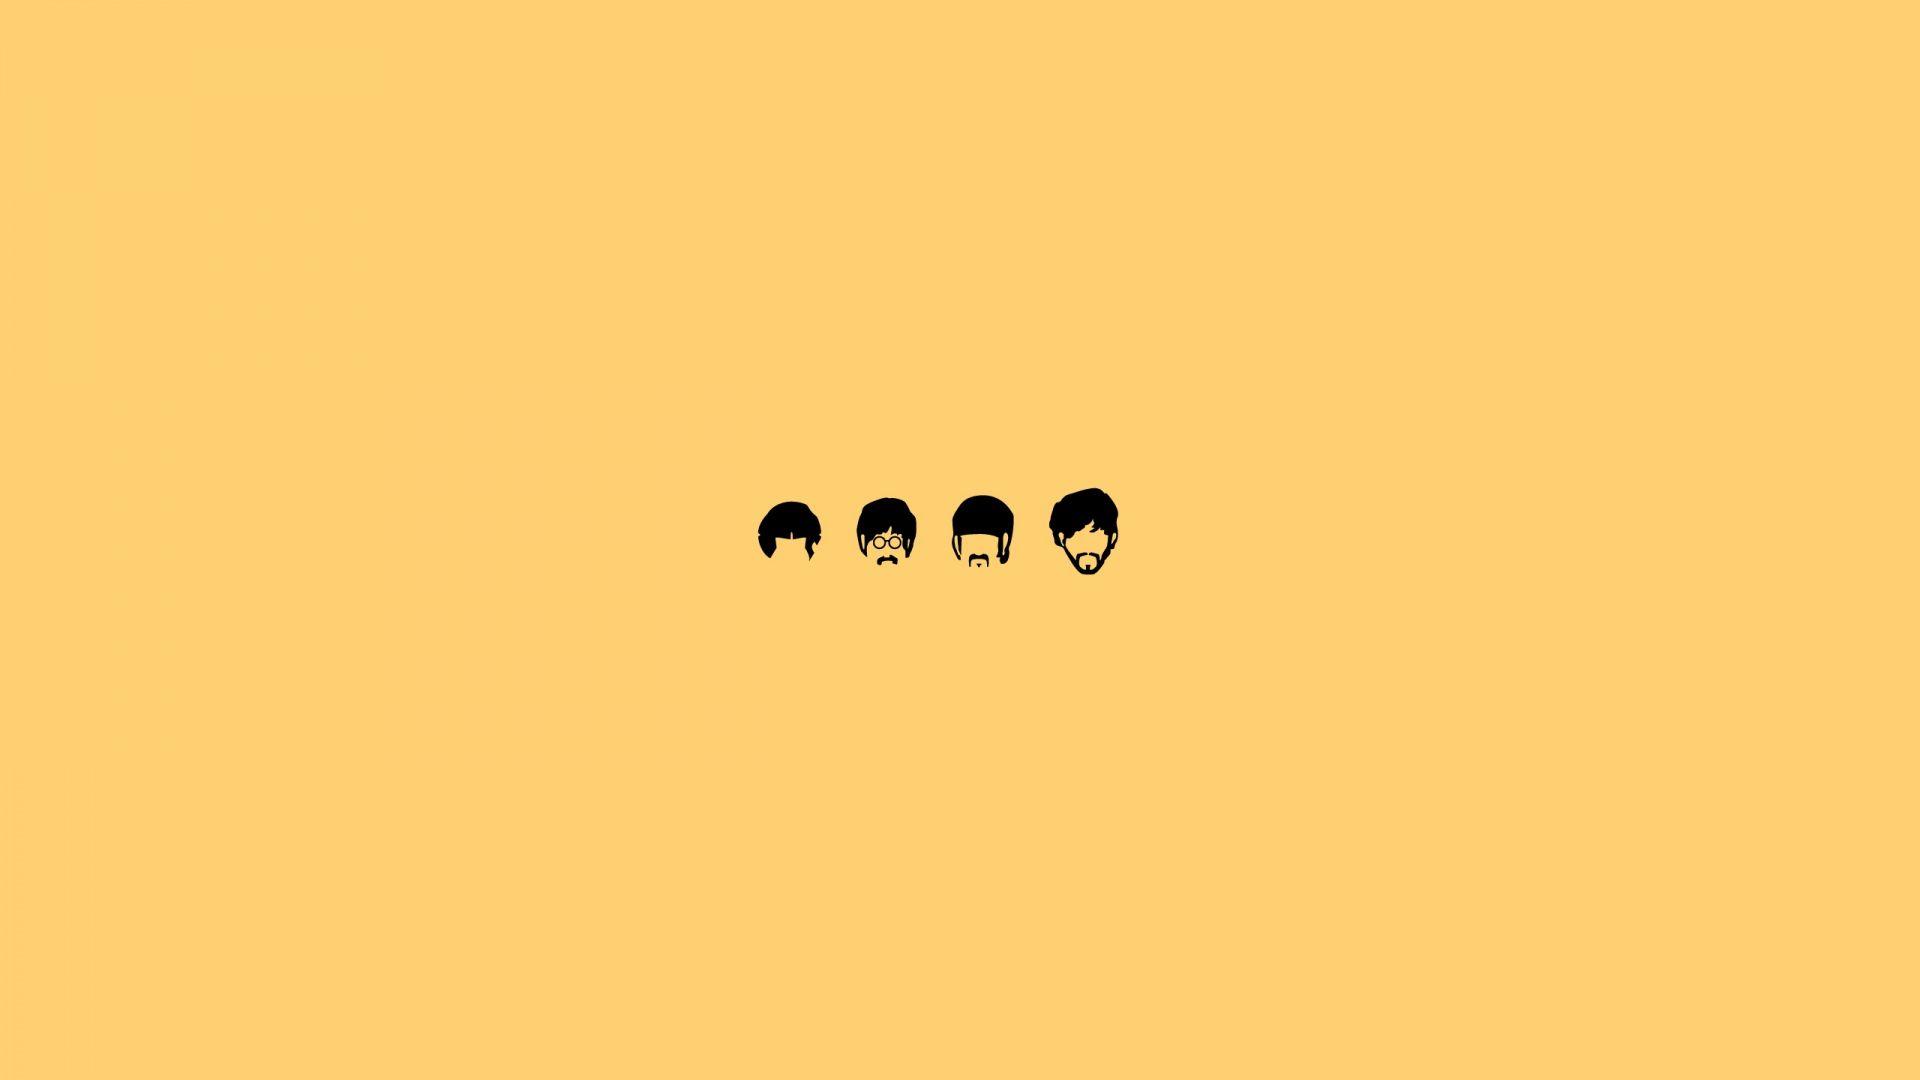 Best 15 The Beatles Wallpapers Beatles wallpaper